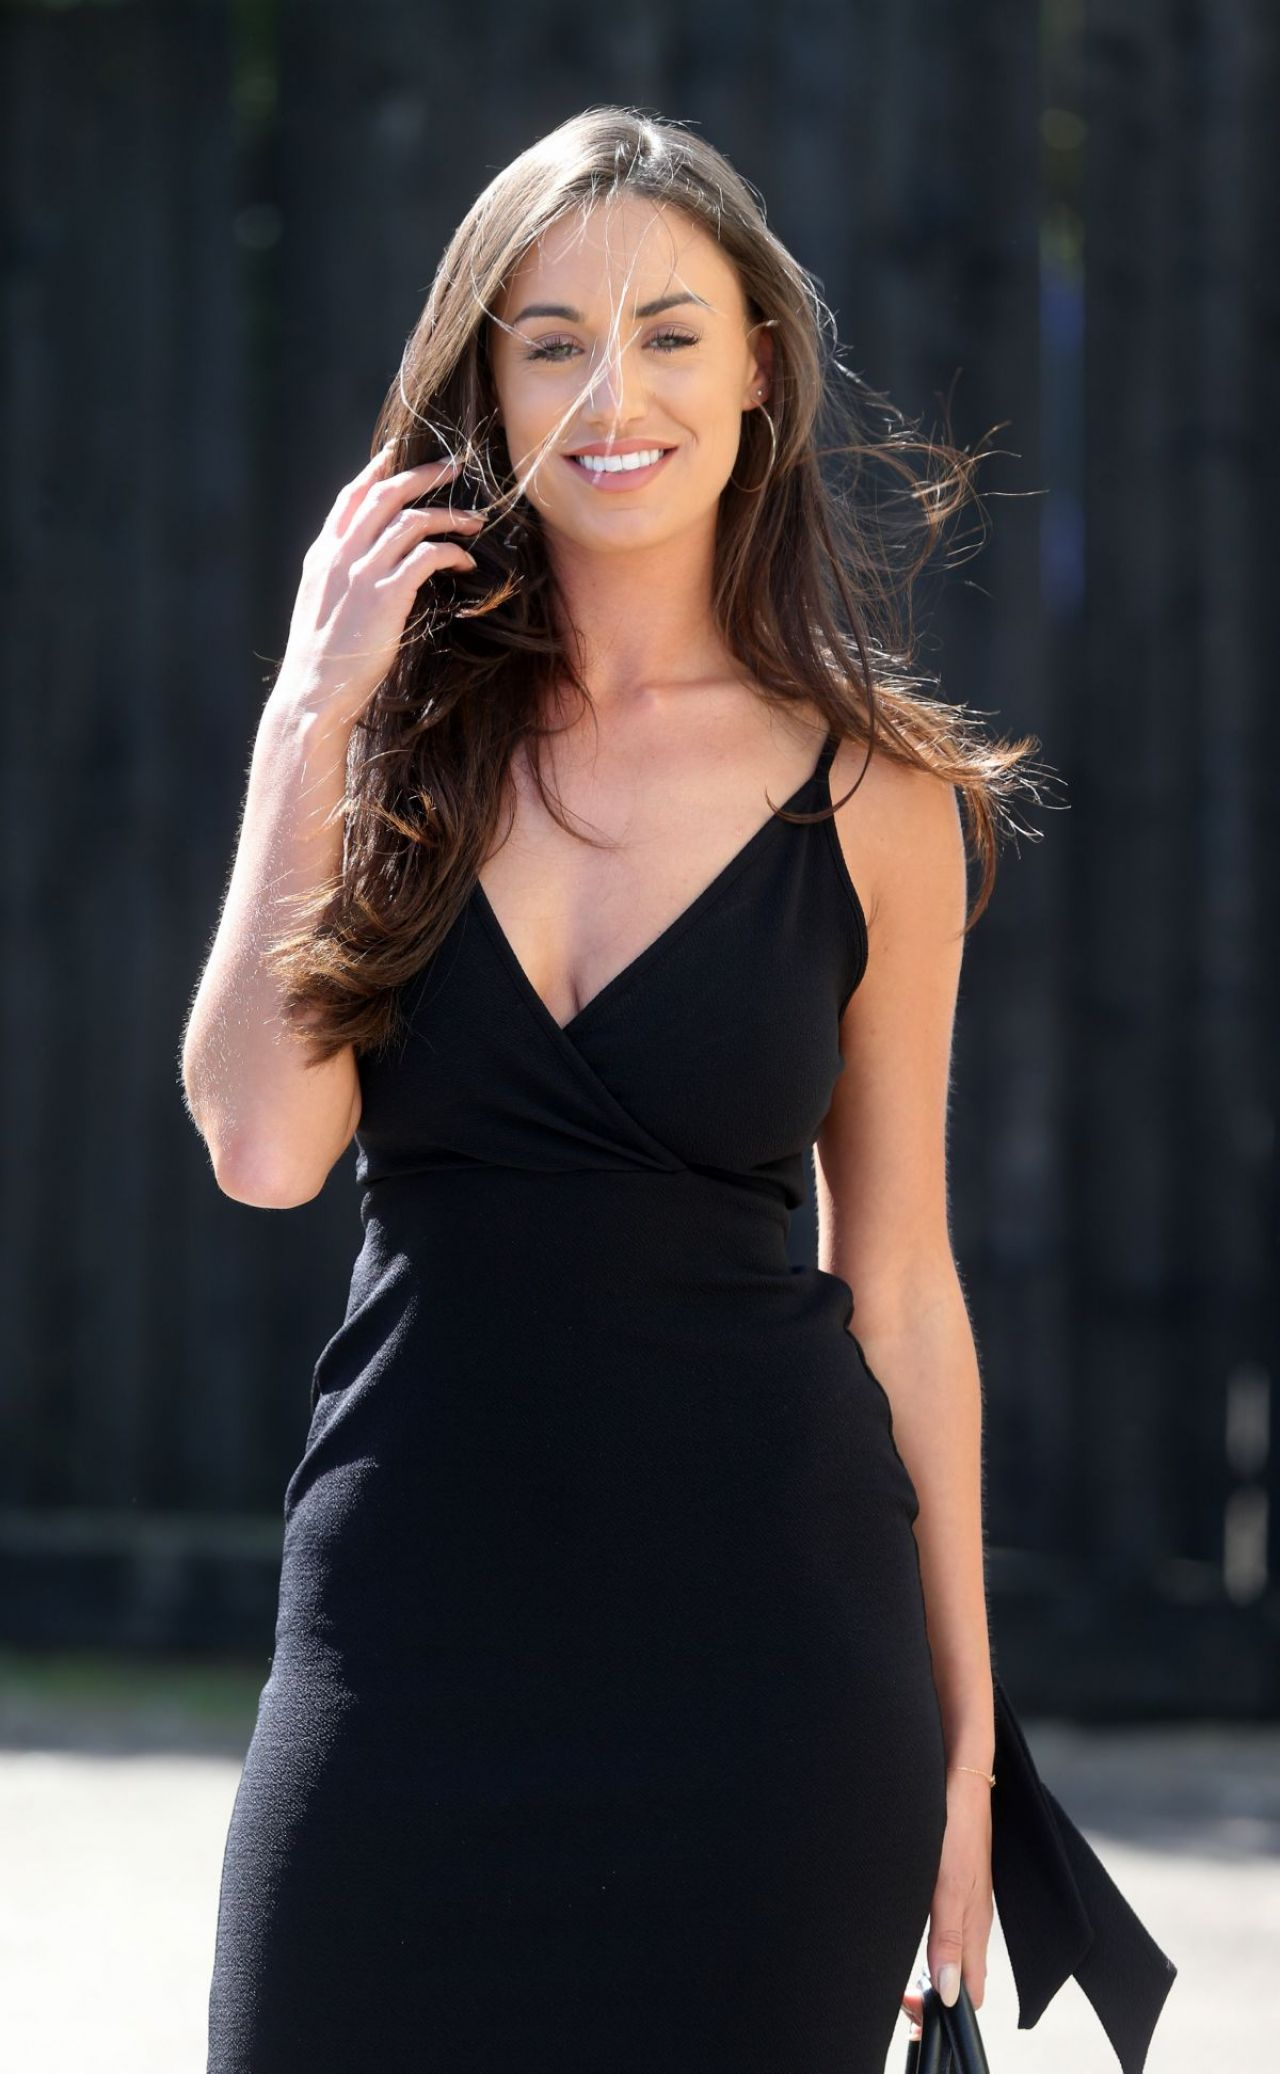 Celebrites Clelia Theodorou nude (13 photo), Sexy, Hot, Feet, panties 2019